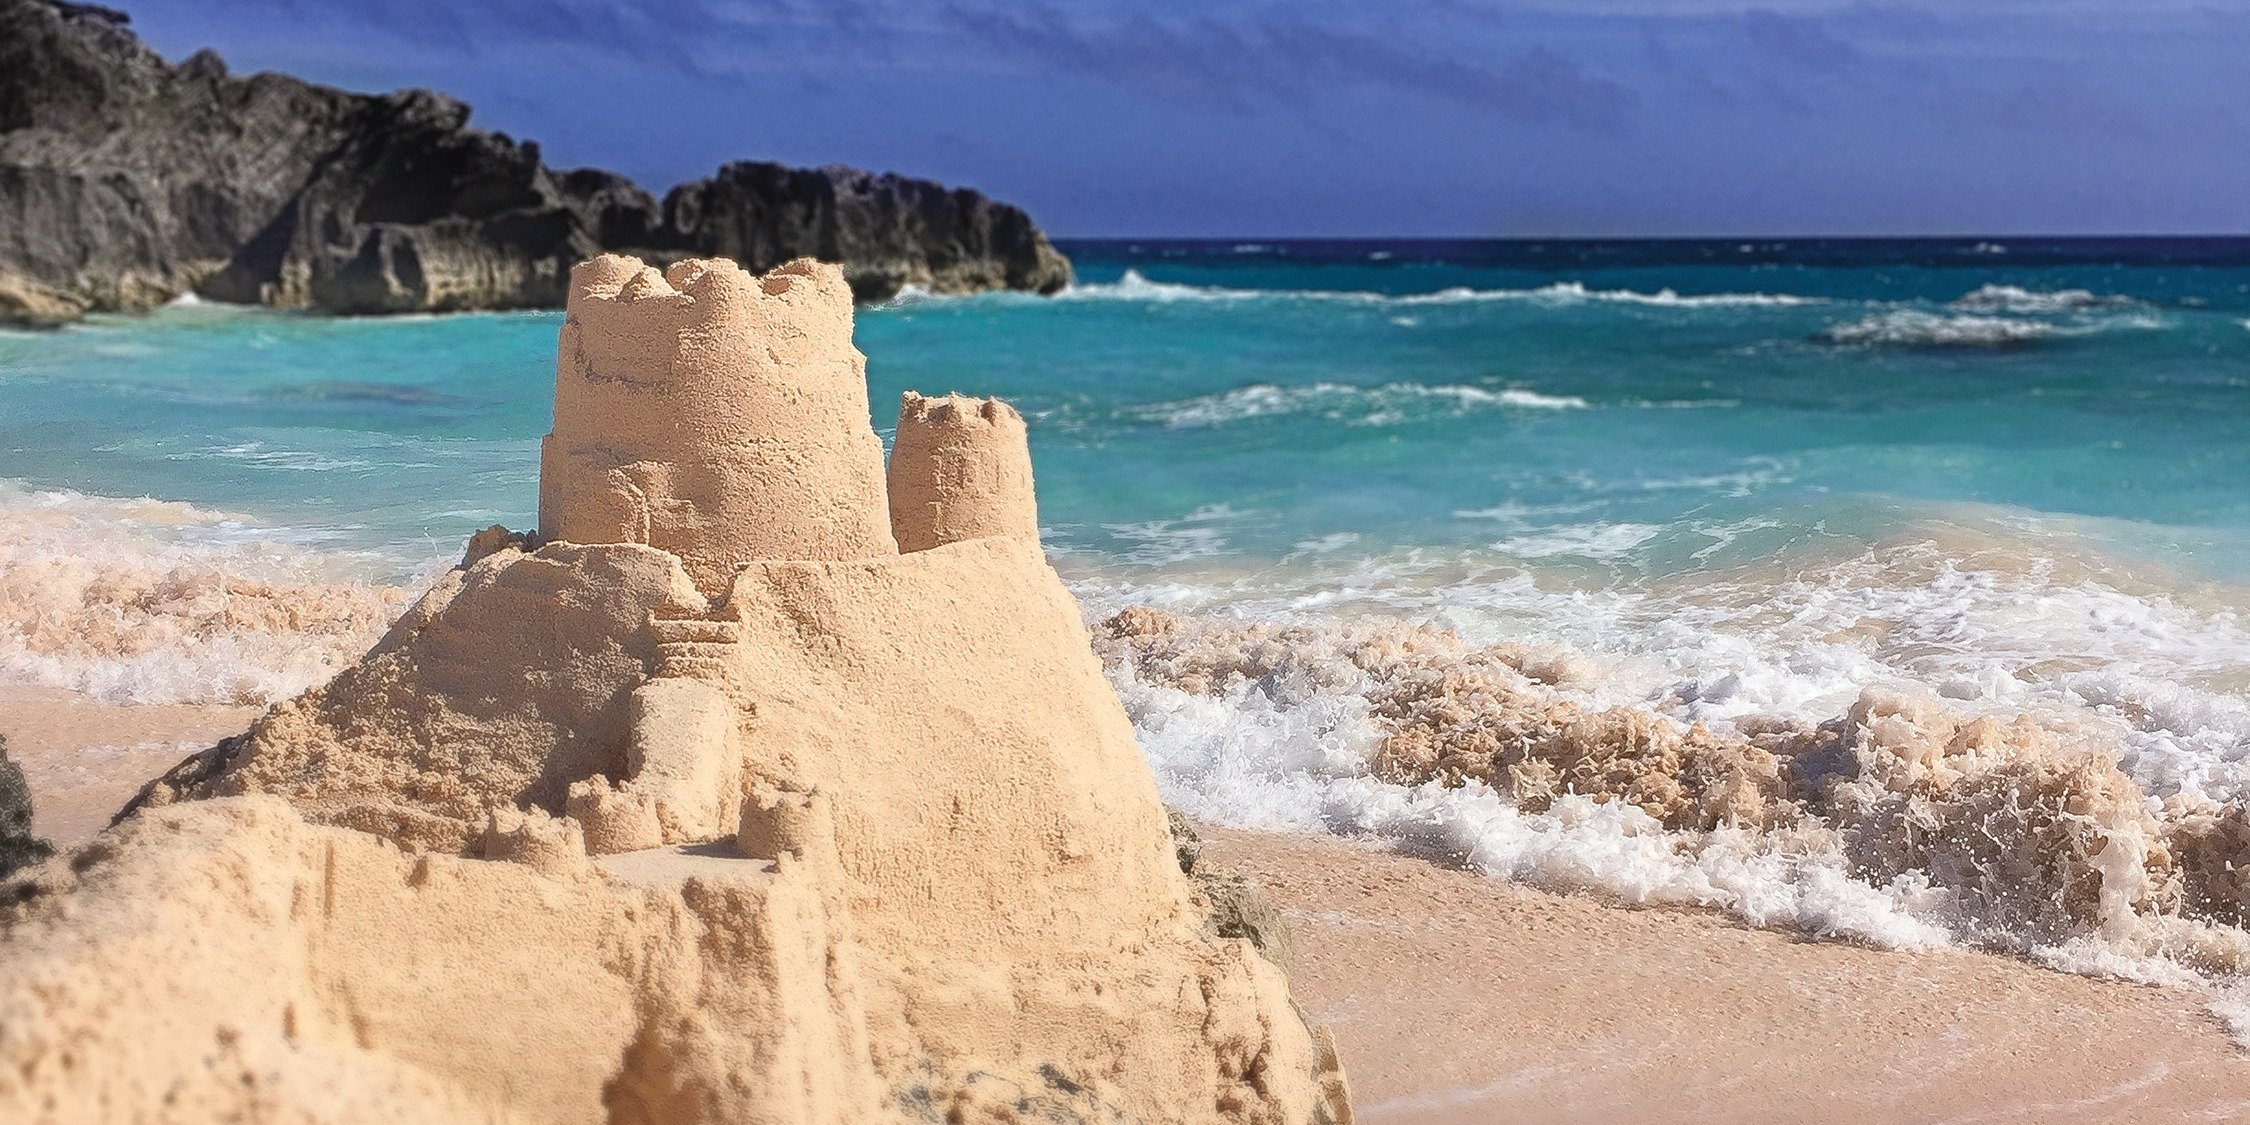 SandcastleatBeach_02_CMYK